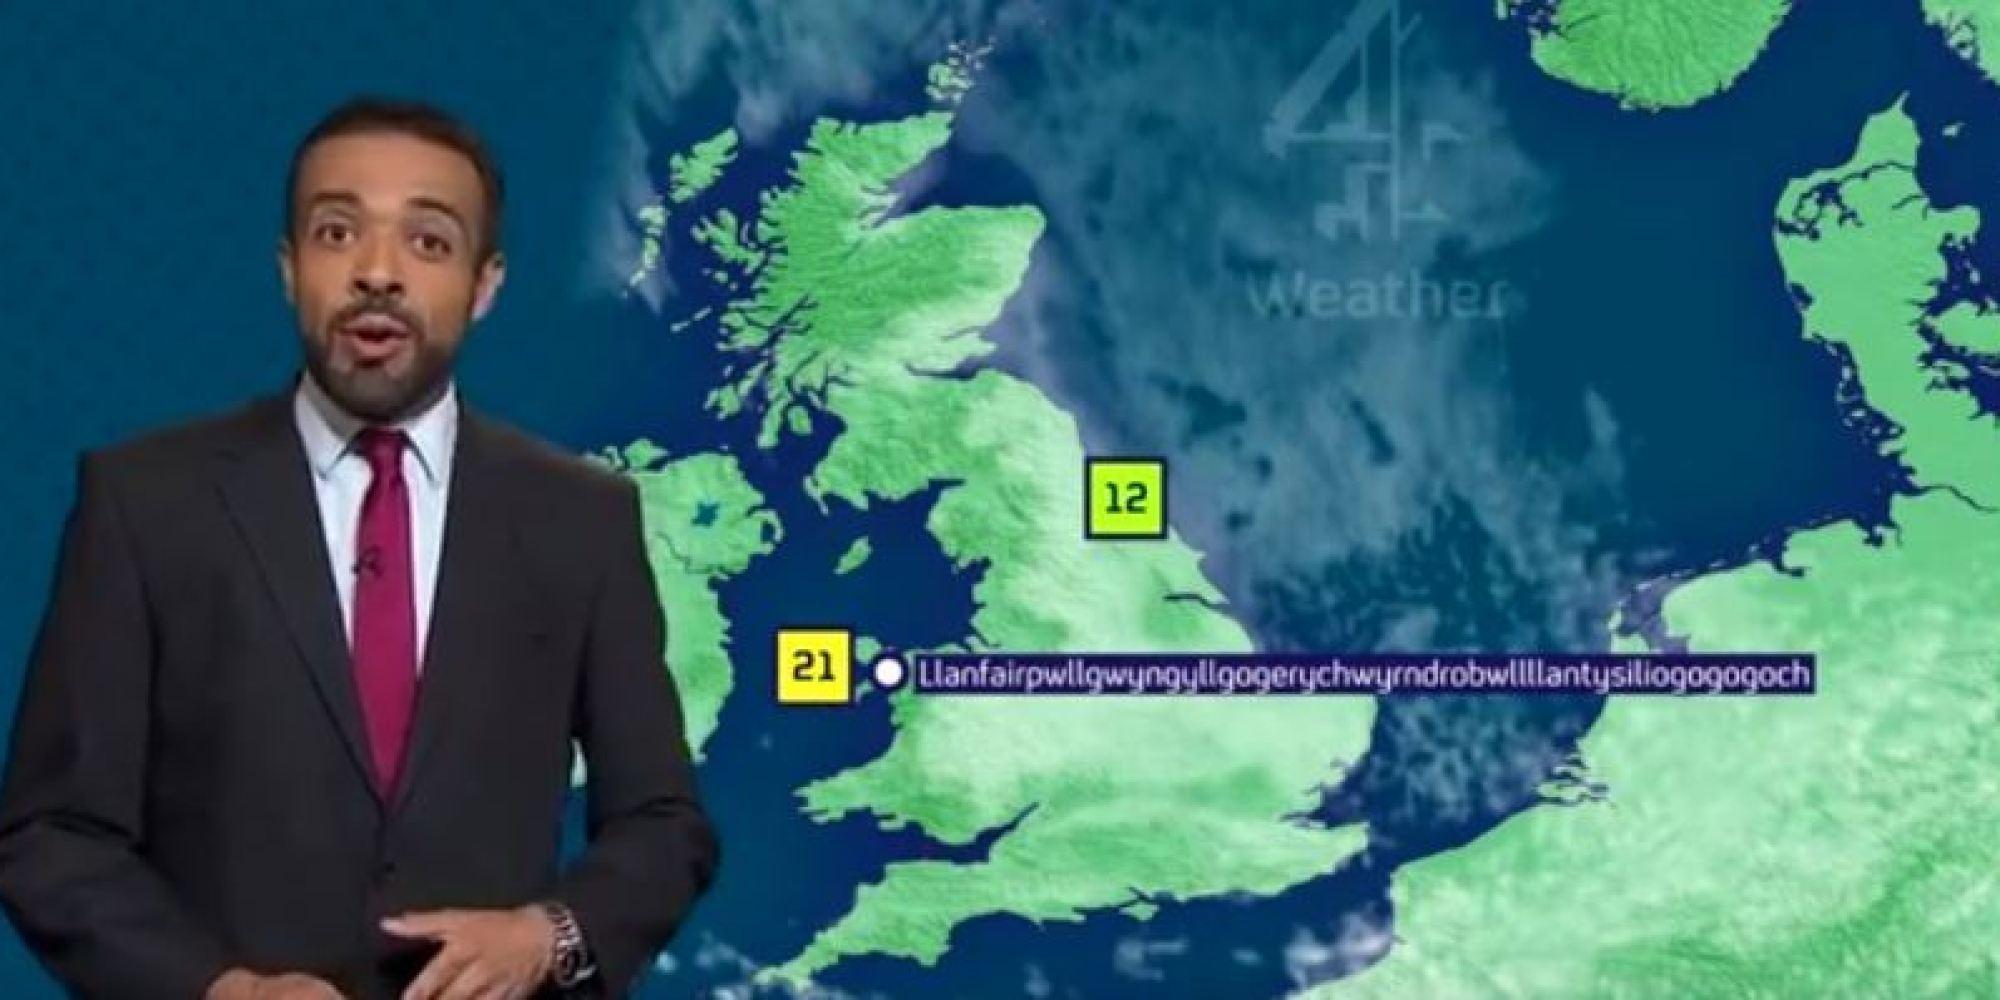 weather presenter nails pronunciation of